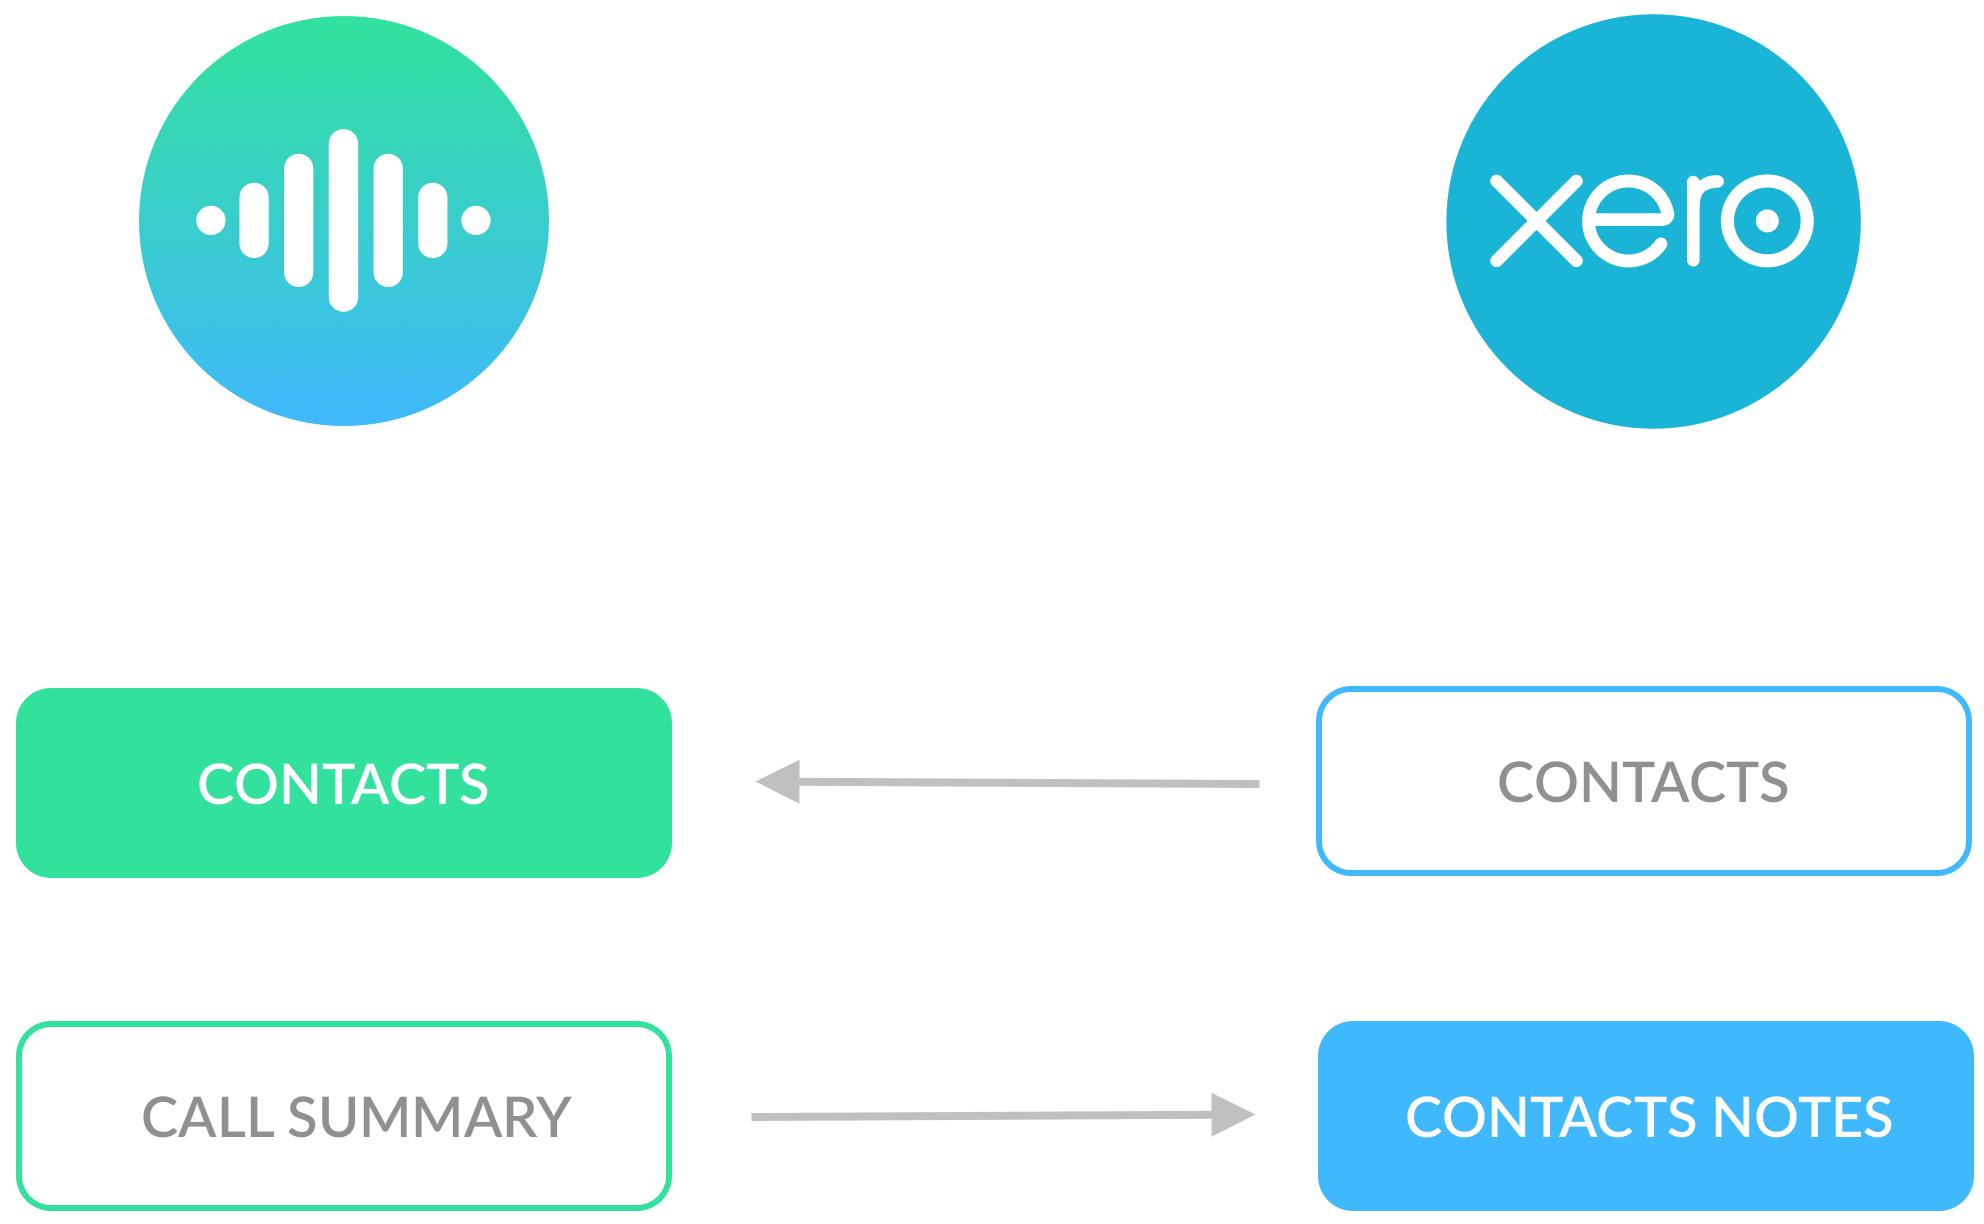 Xero Contact Sync with Cradle